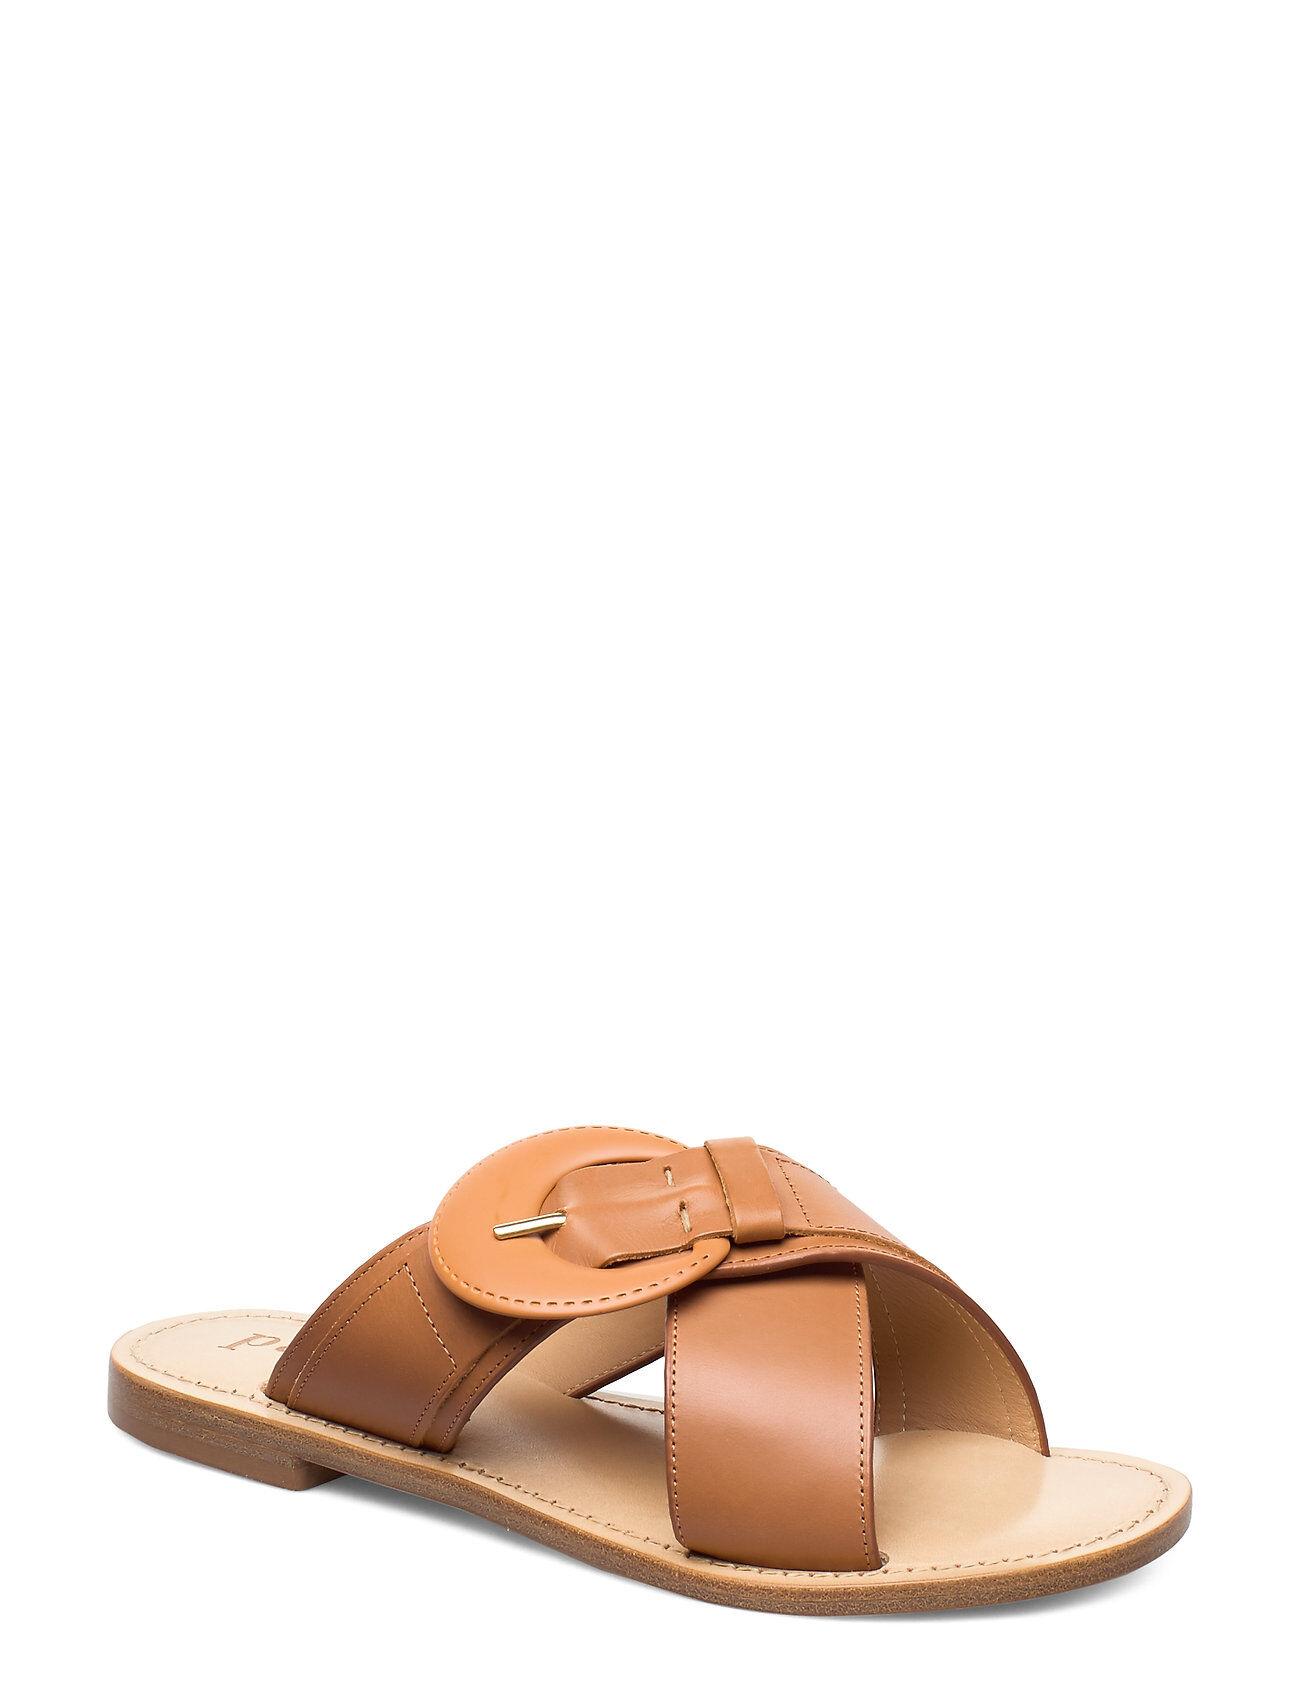 Apair Buckle Luxury Sandal Shoes Summer Shoes Flat Sandals Ruskea Apair